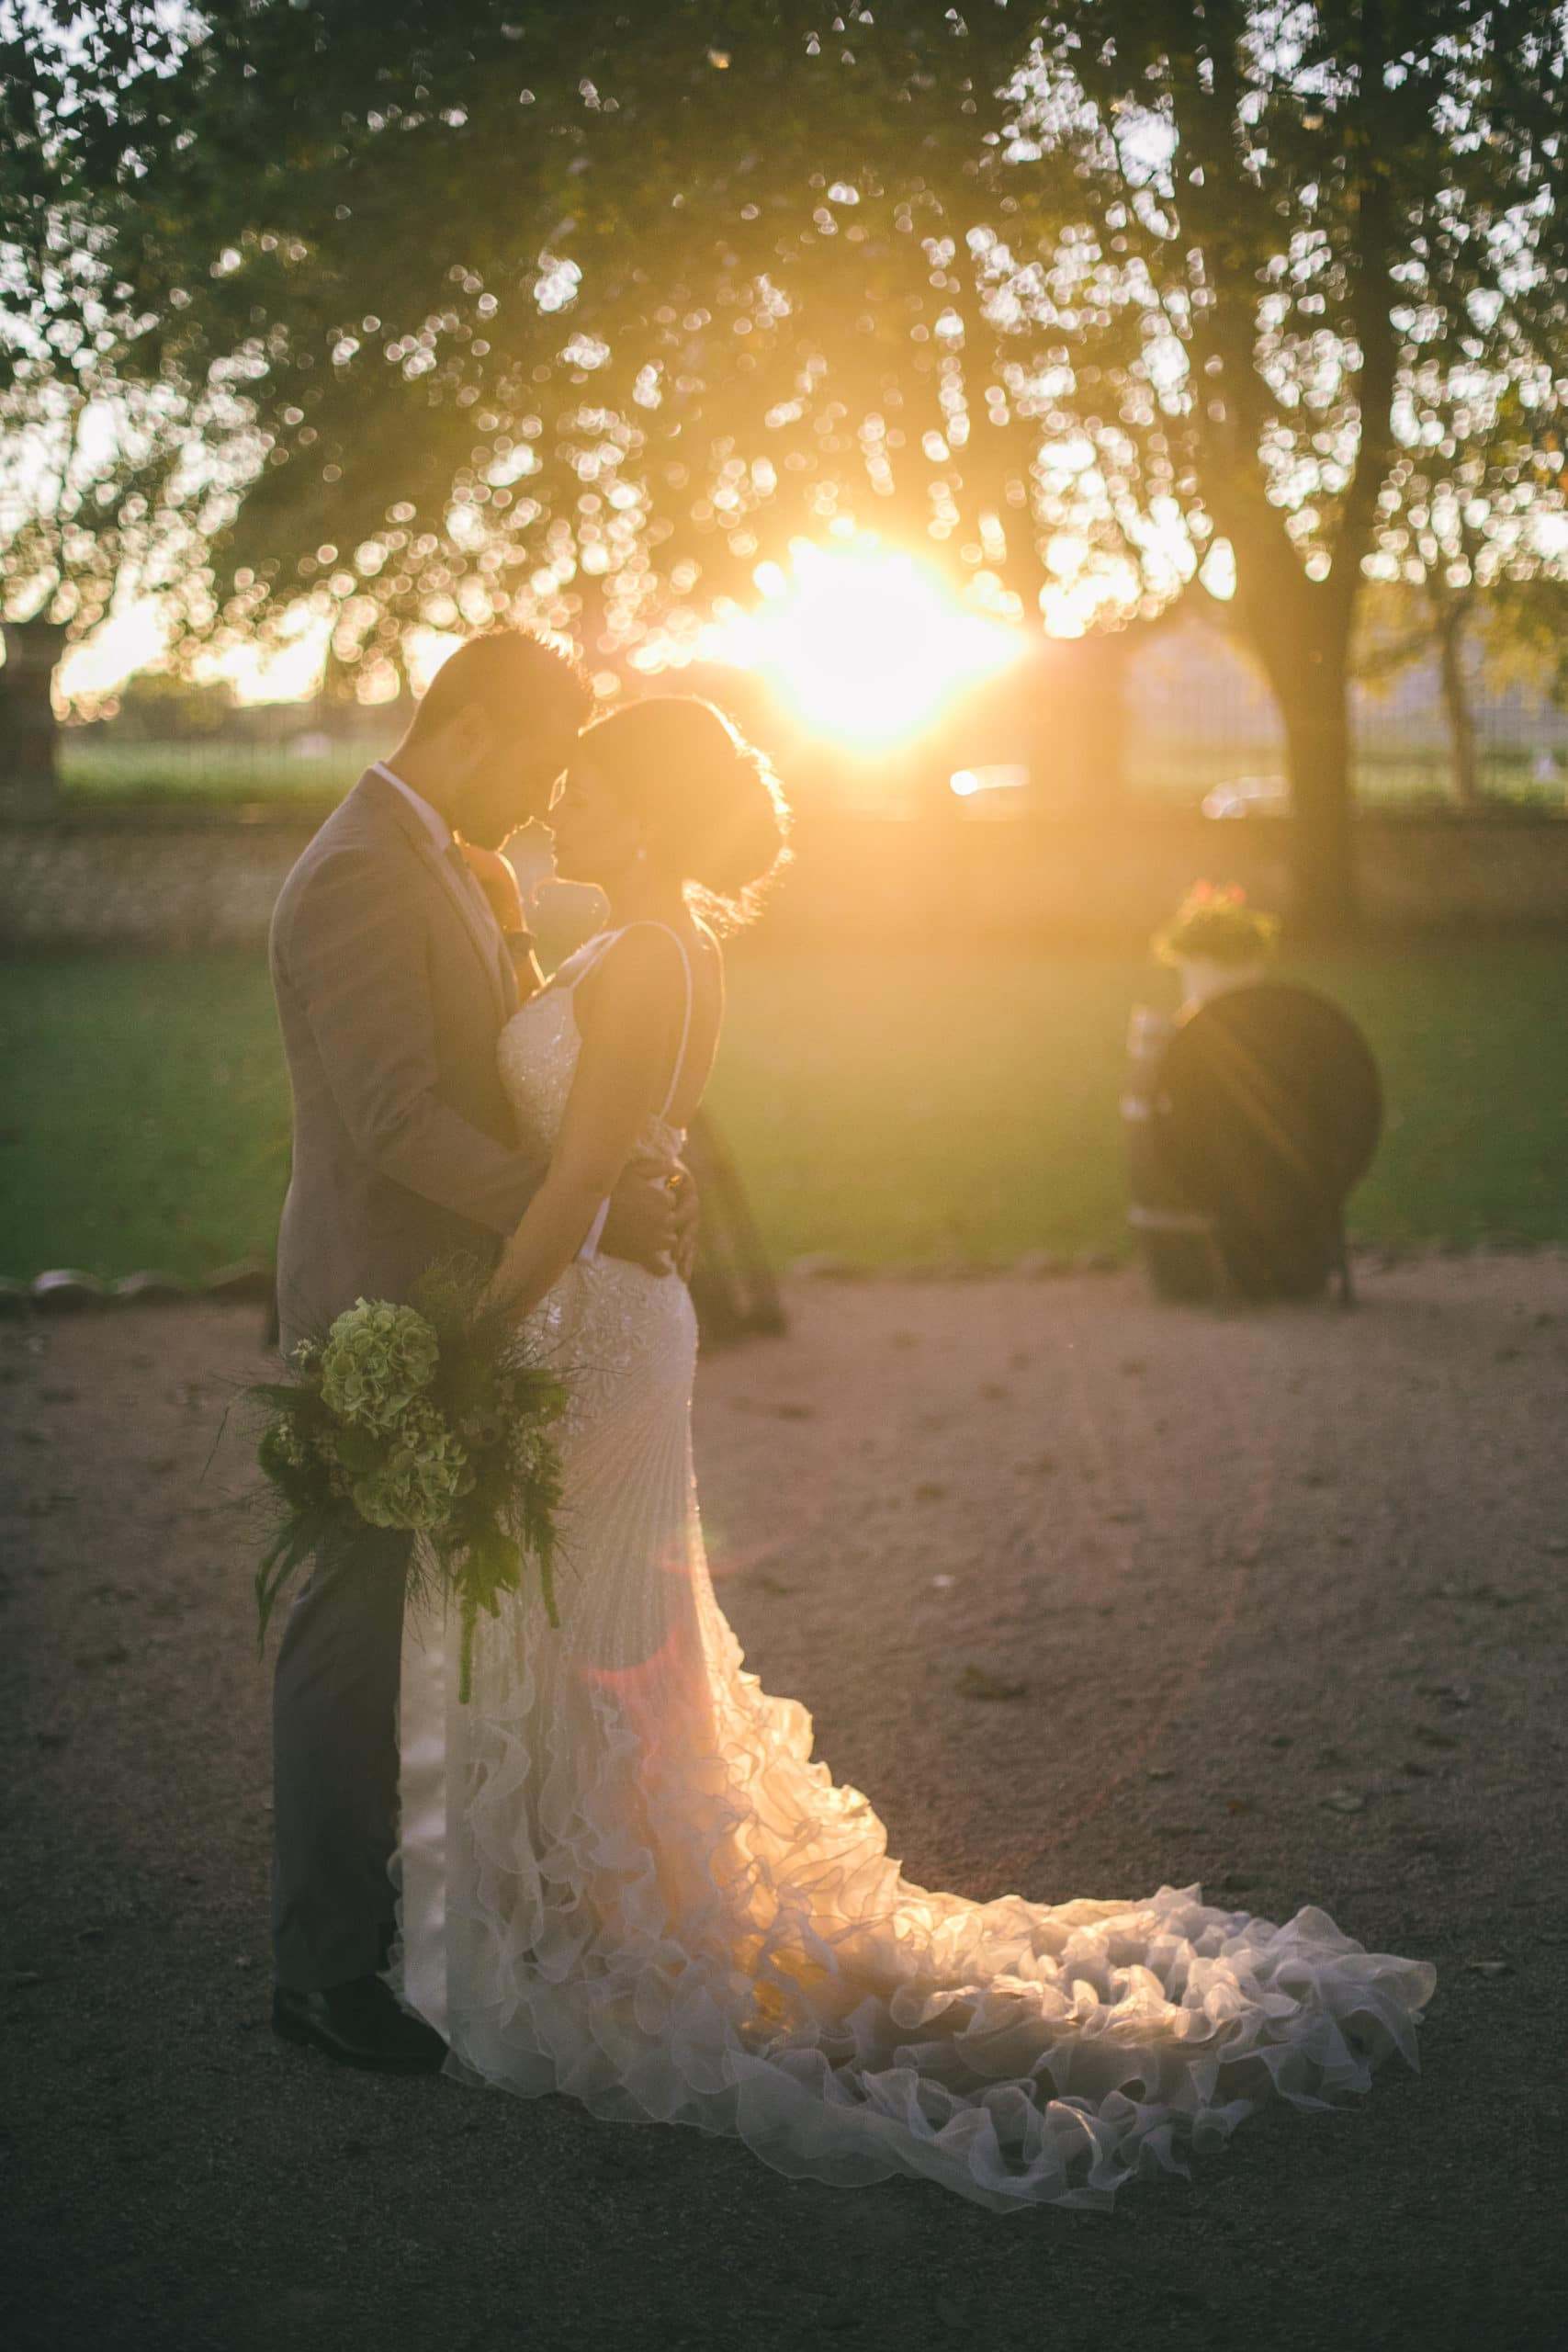 bride-groom-couple-parc-sunset-wedding-chateau-venue-reception-south-france-provence-magic